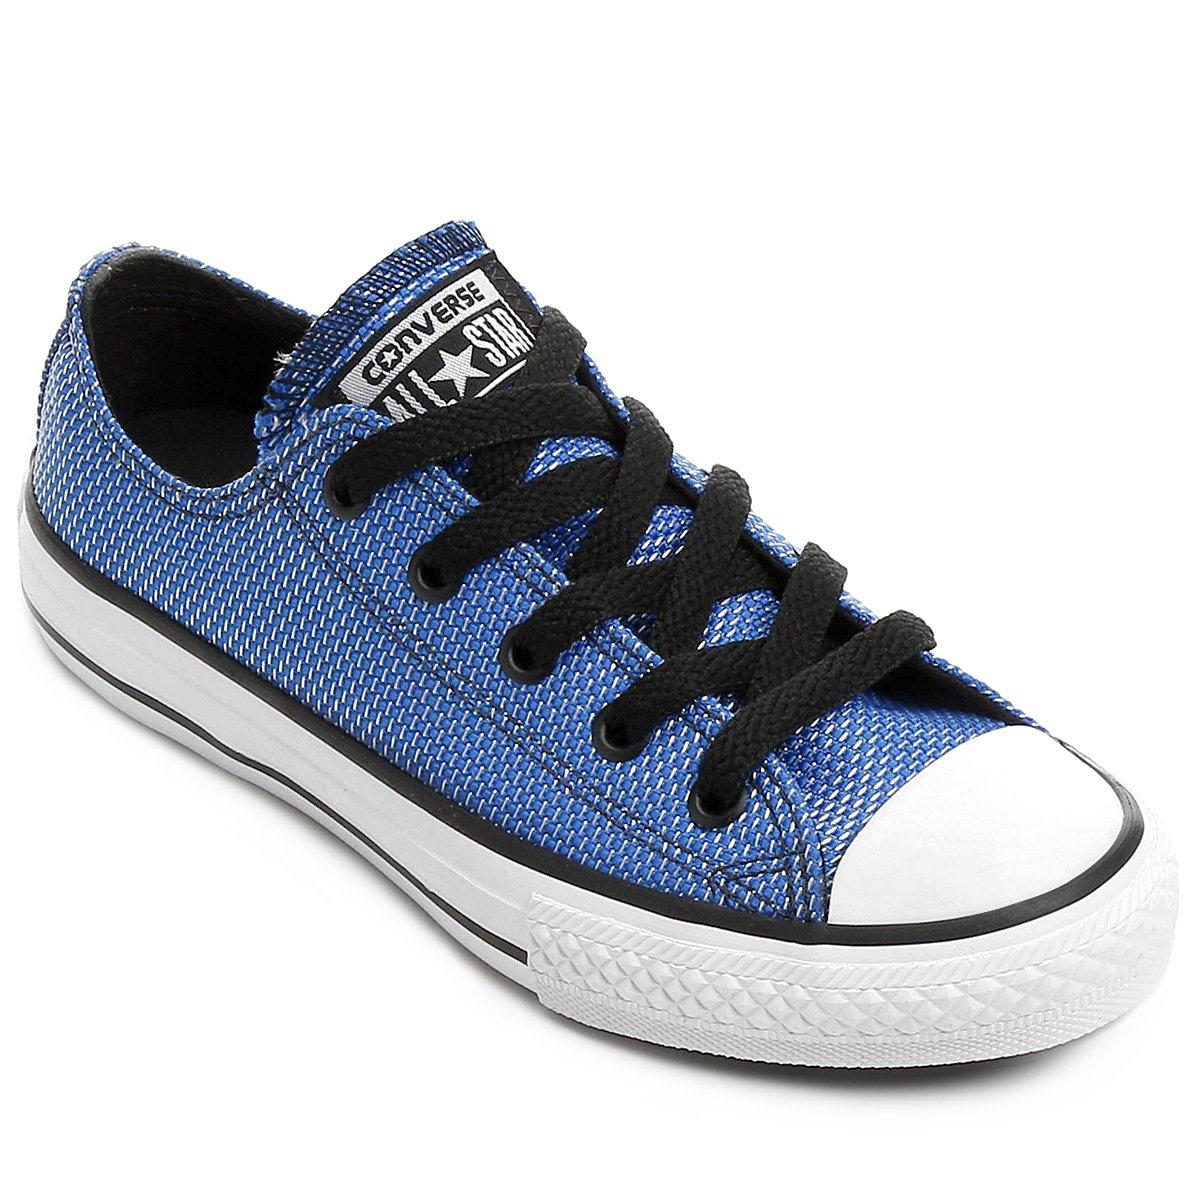 66912270c6 ... store tênis converse chuck taylor all star i infantil azul 9d9a5 eb3fd